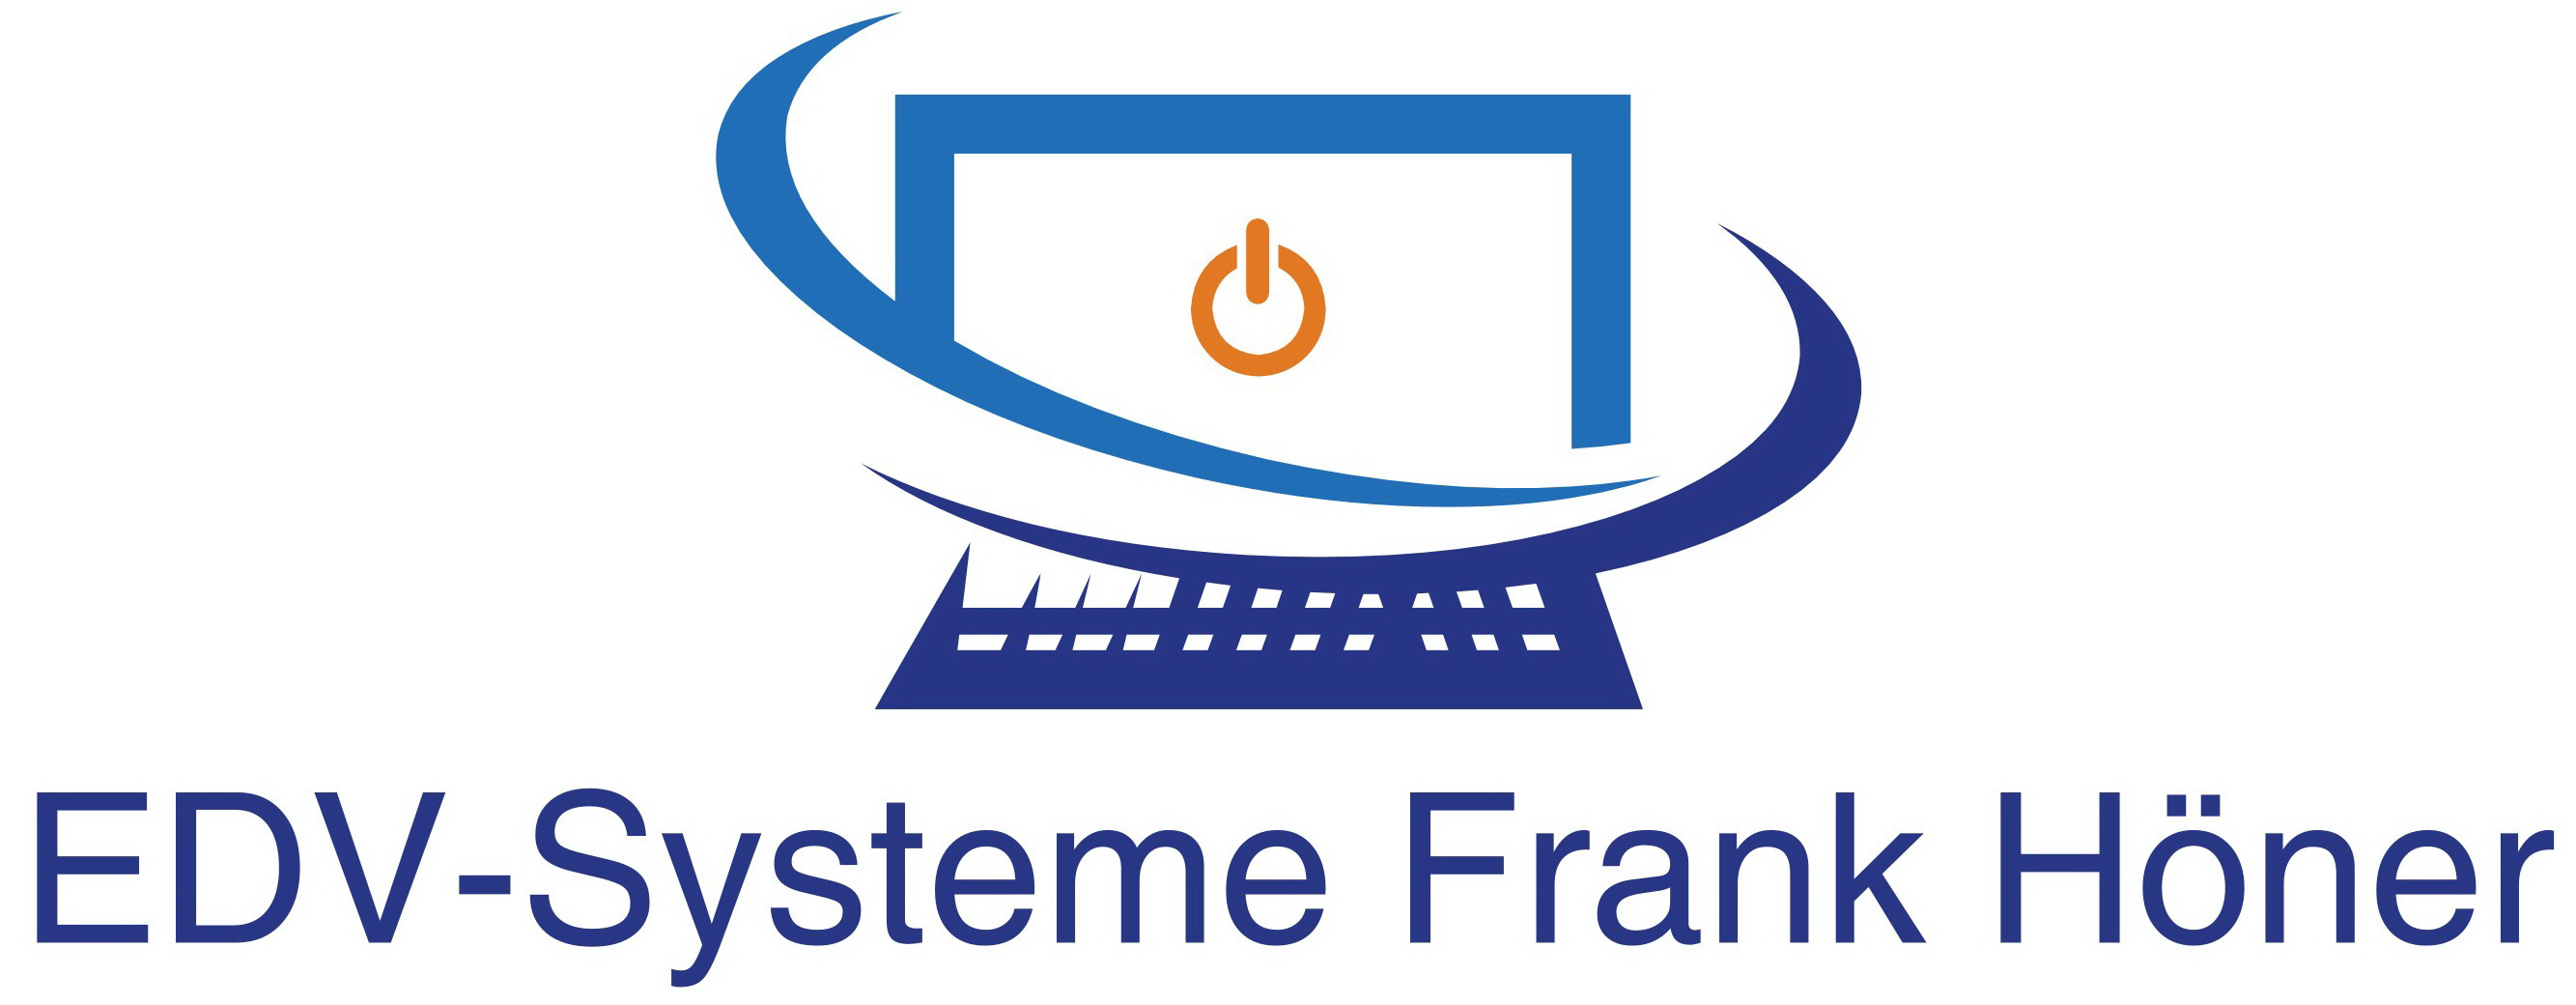 EDV-Systeme